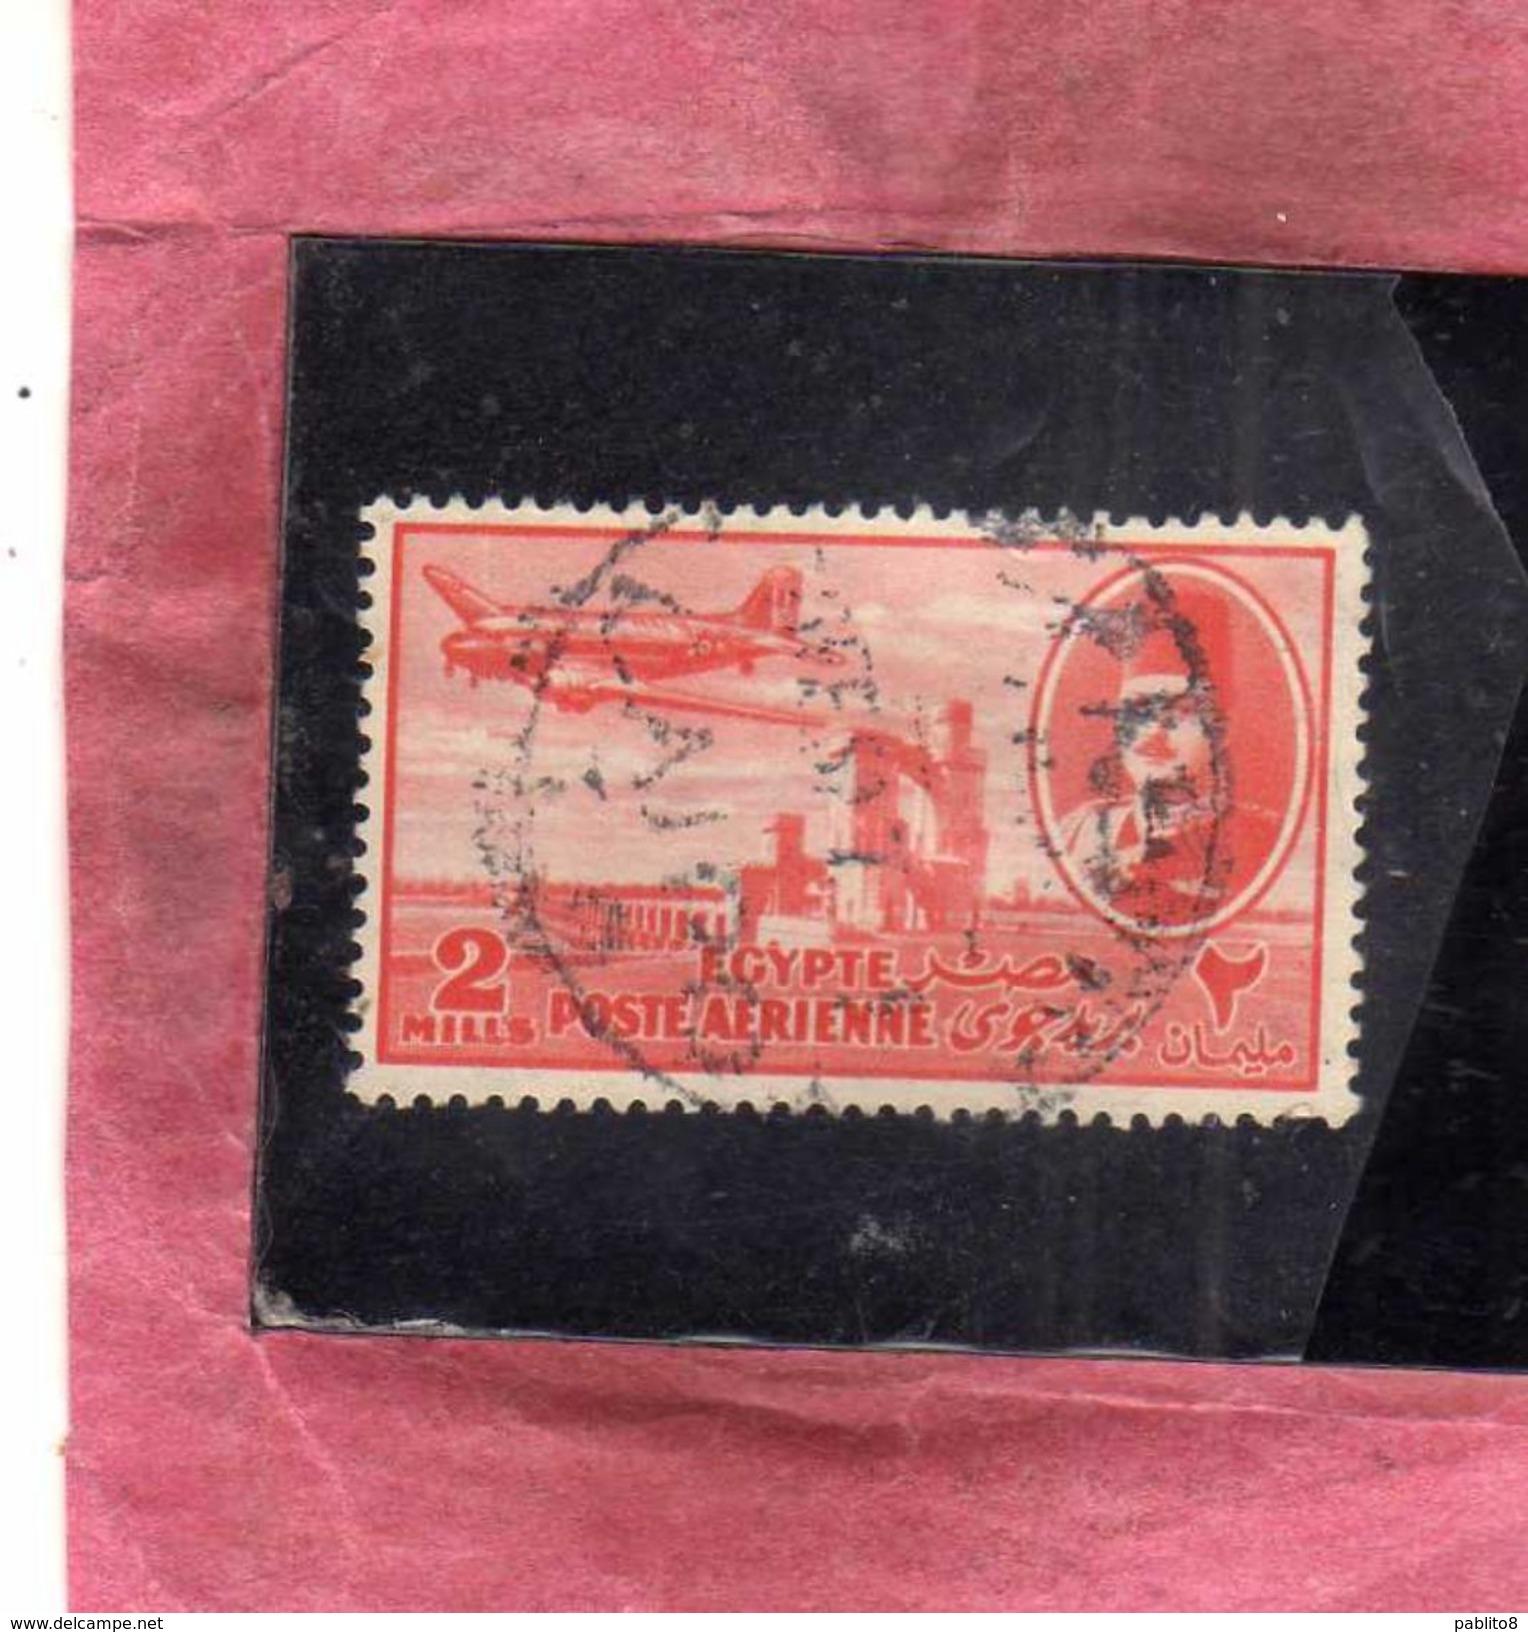 EGYPT EGITTO 1947 AIR MAIL POSTA AEREA KING FAROUK DELTA DAM DC-3 PLANE 2m USATO USED OBLITERE' - Posta Aerea